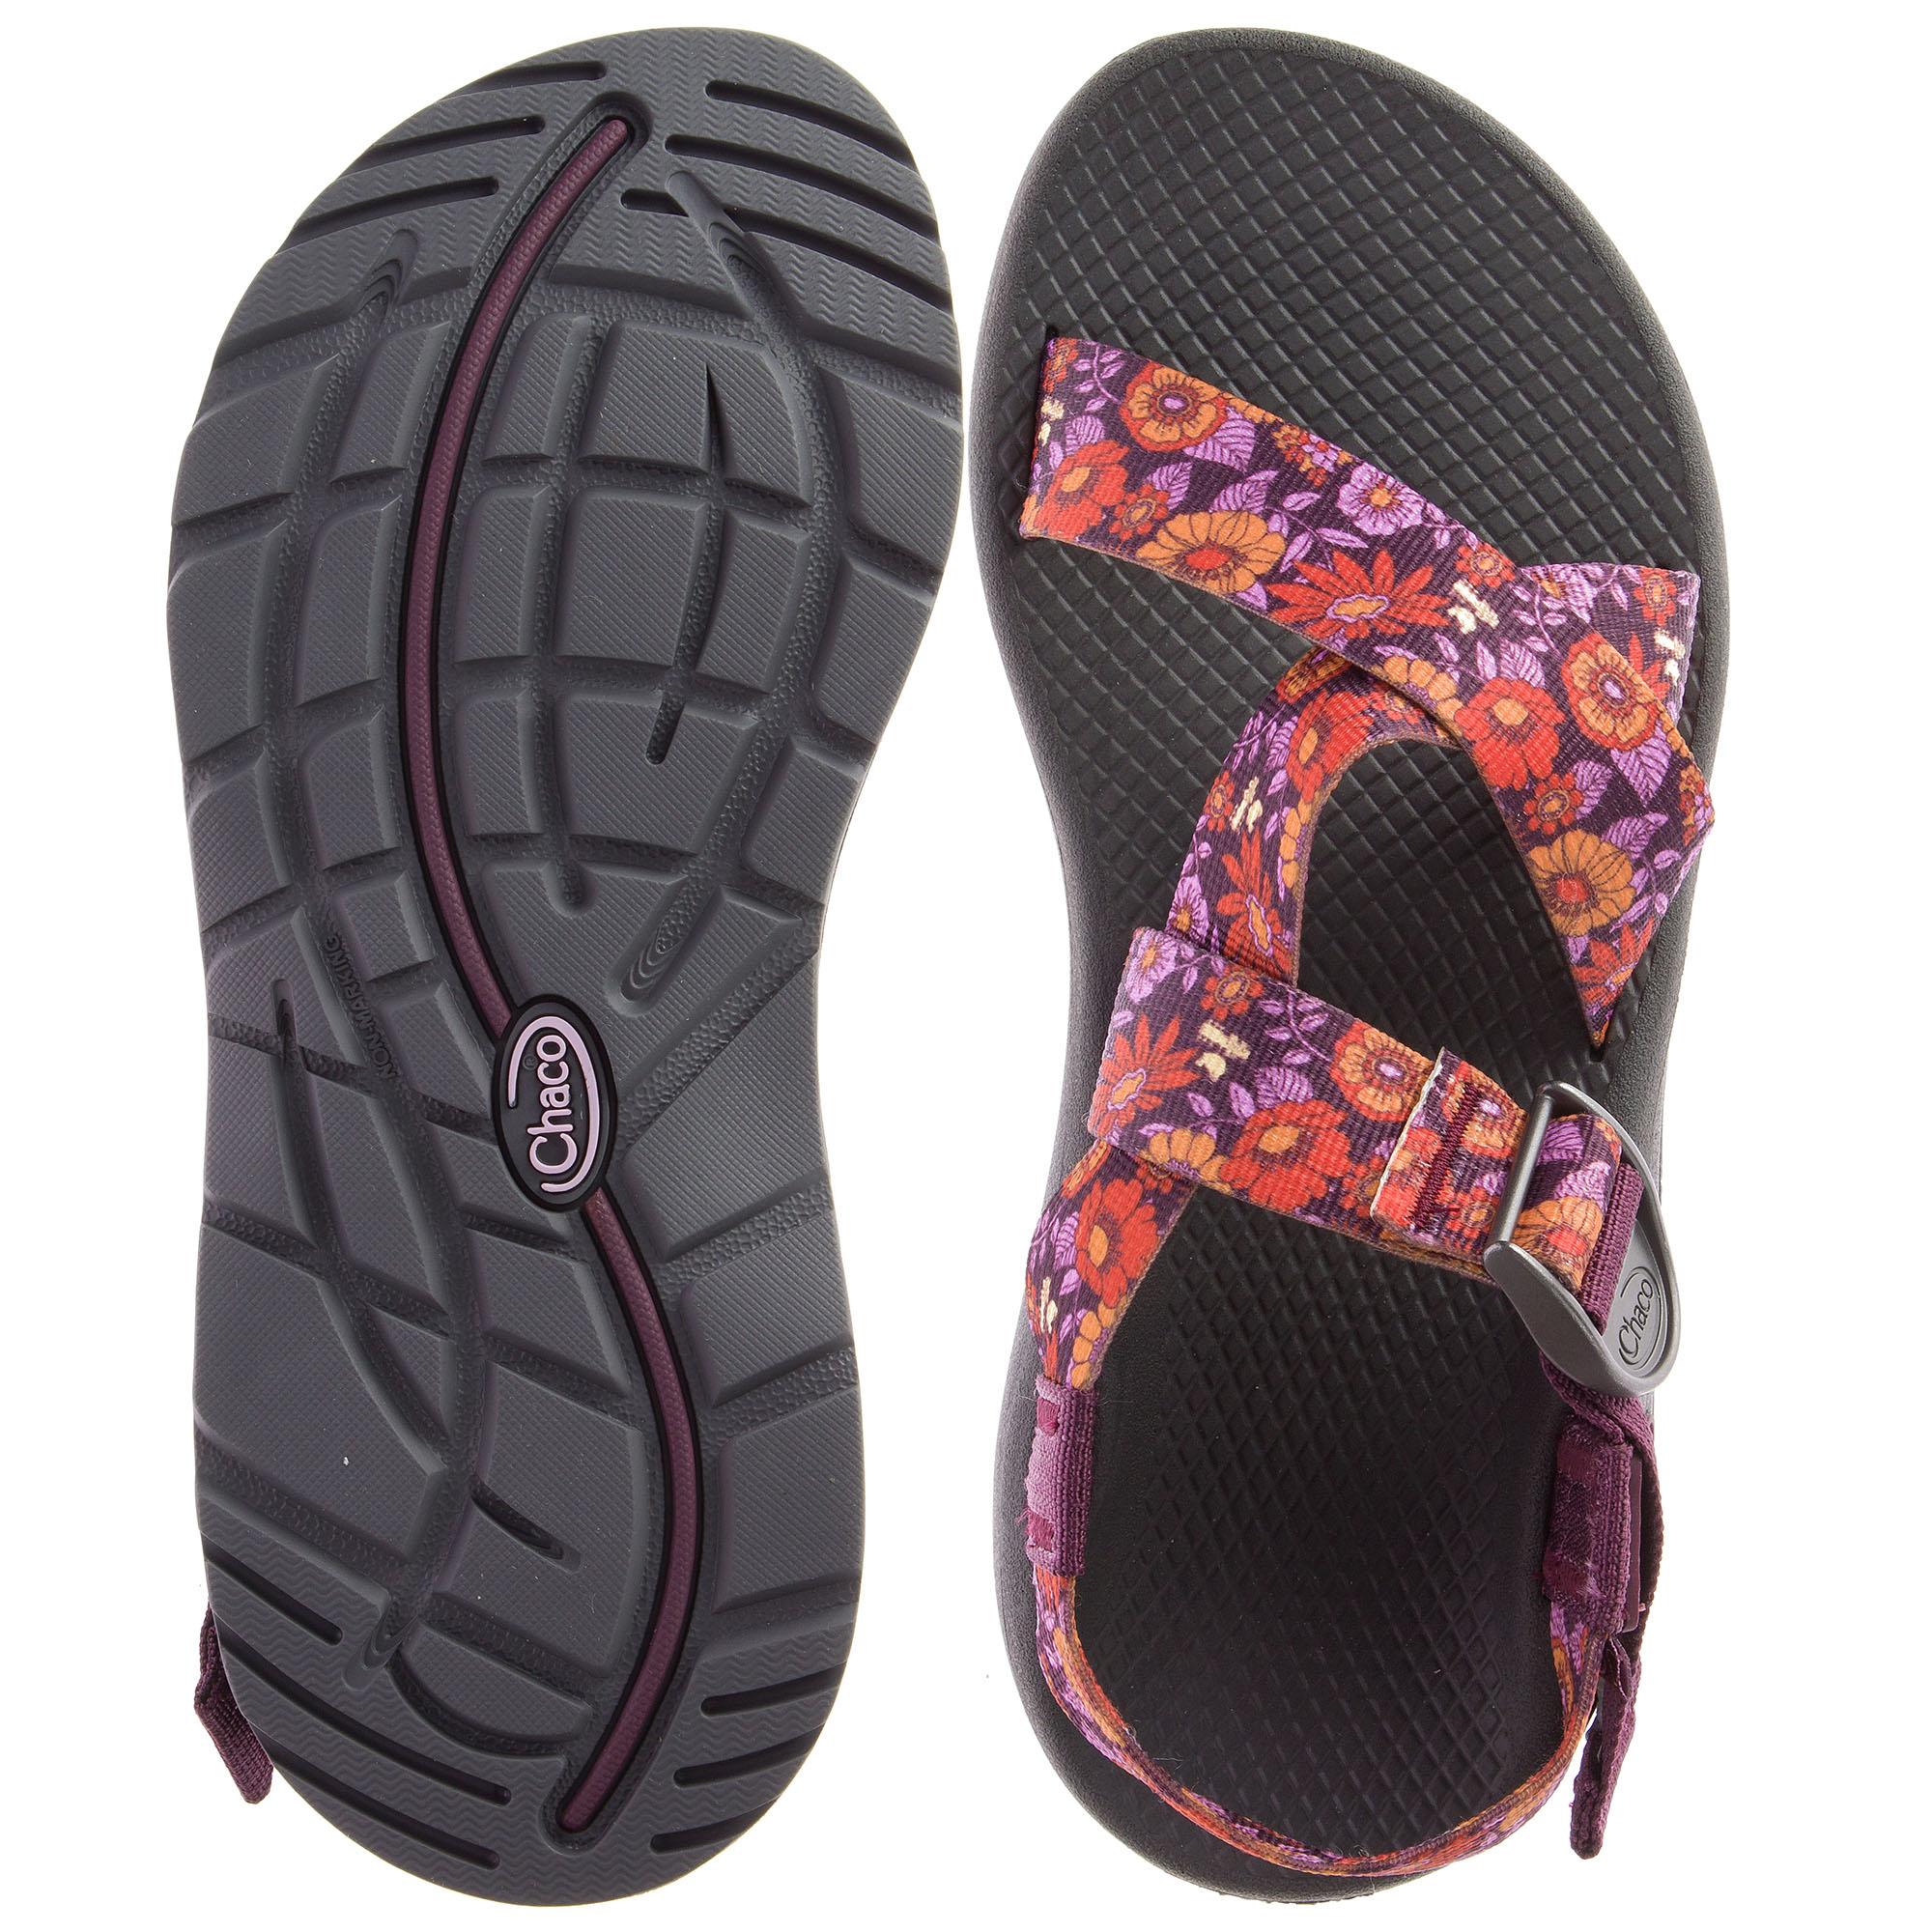 4dbf1e5a6fc5 Chaco Women s Mega Z Cloud Woodstock Sandals - Sun   Ski Sports